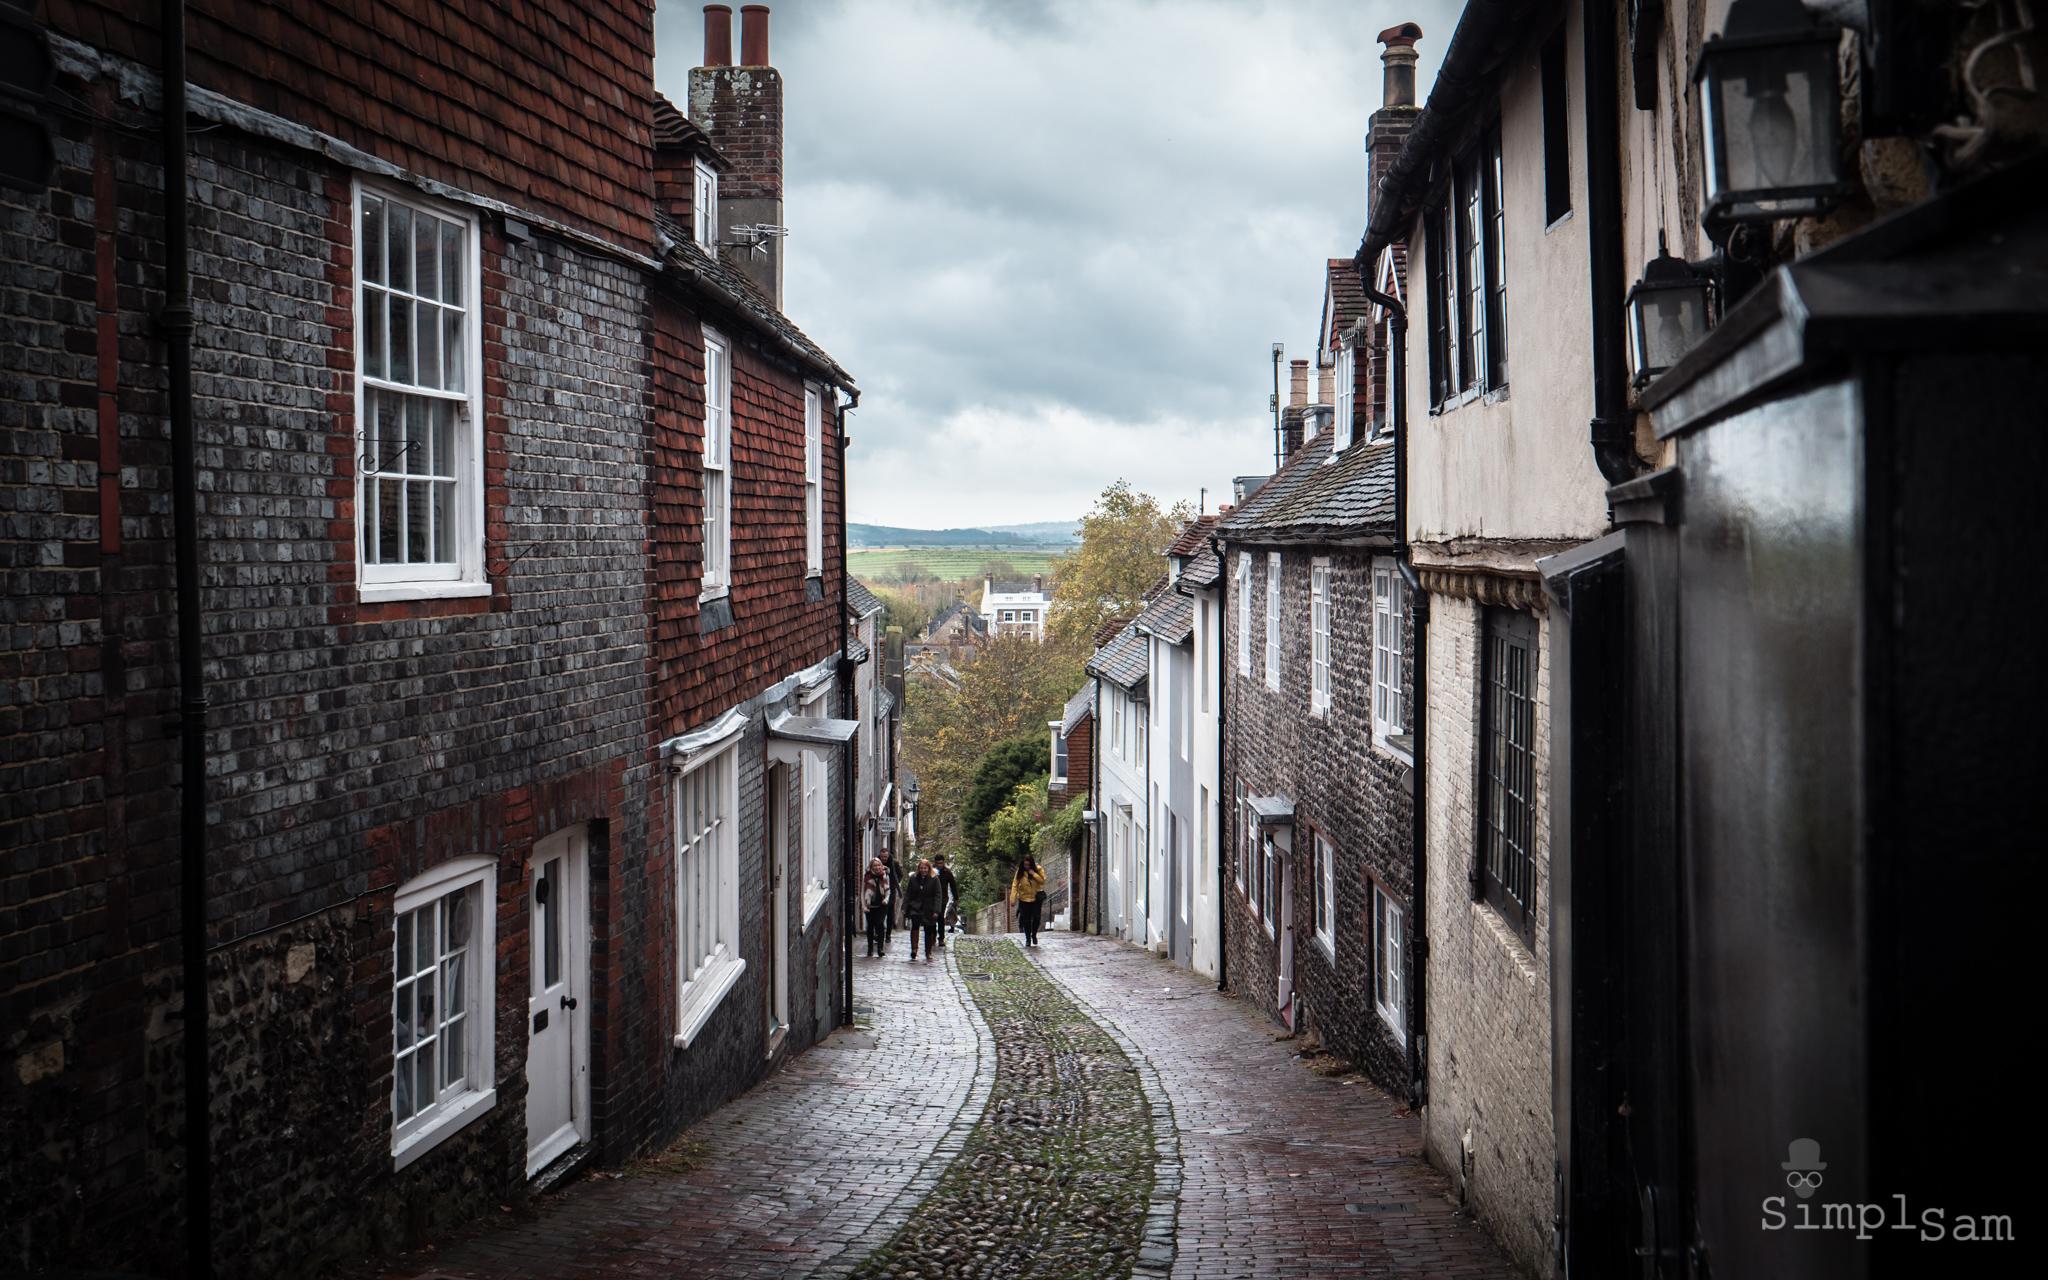 Lewes Bonefire 2017 - Cobbled Streets